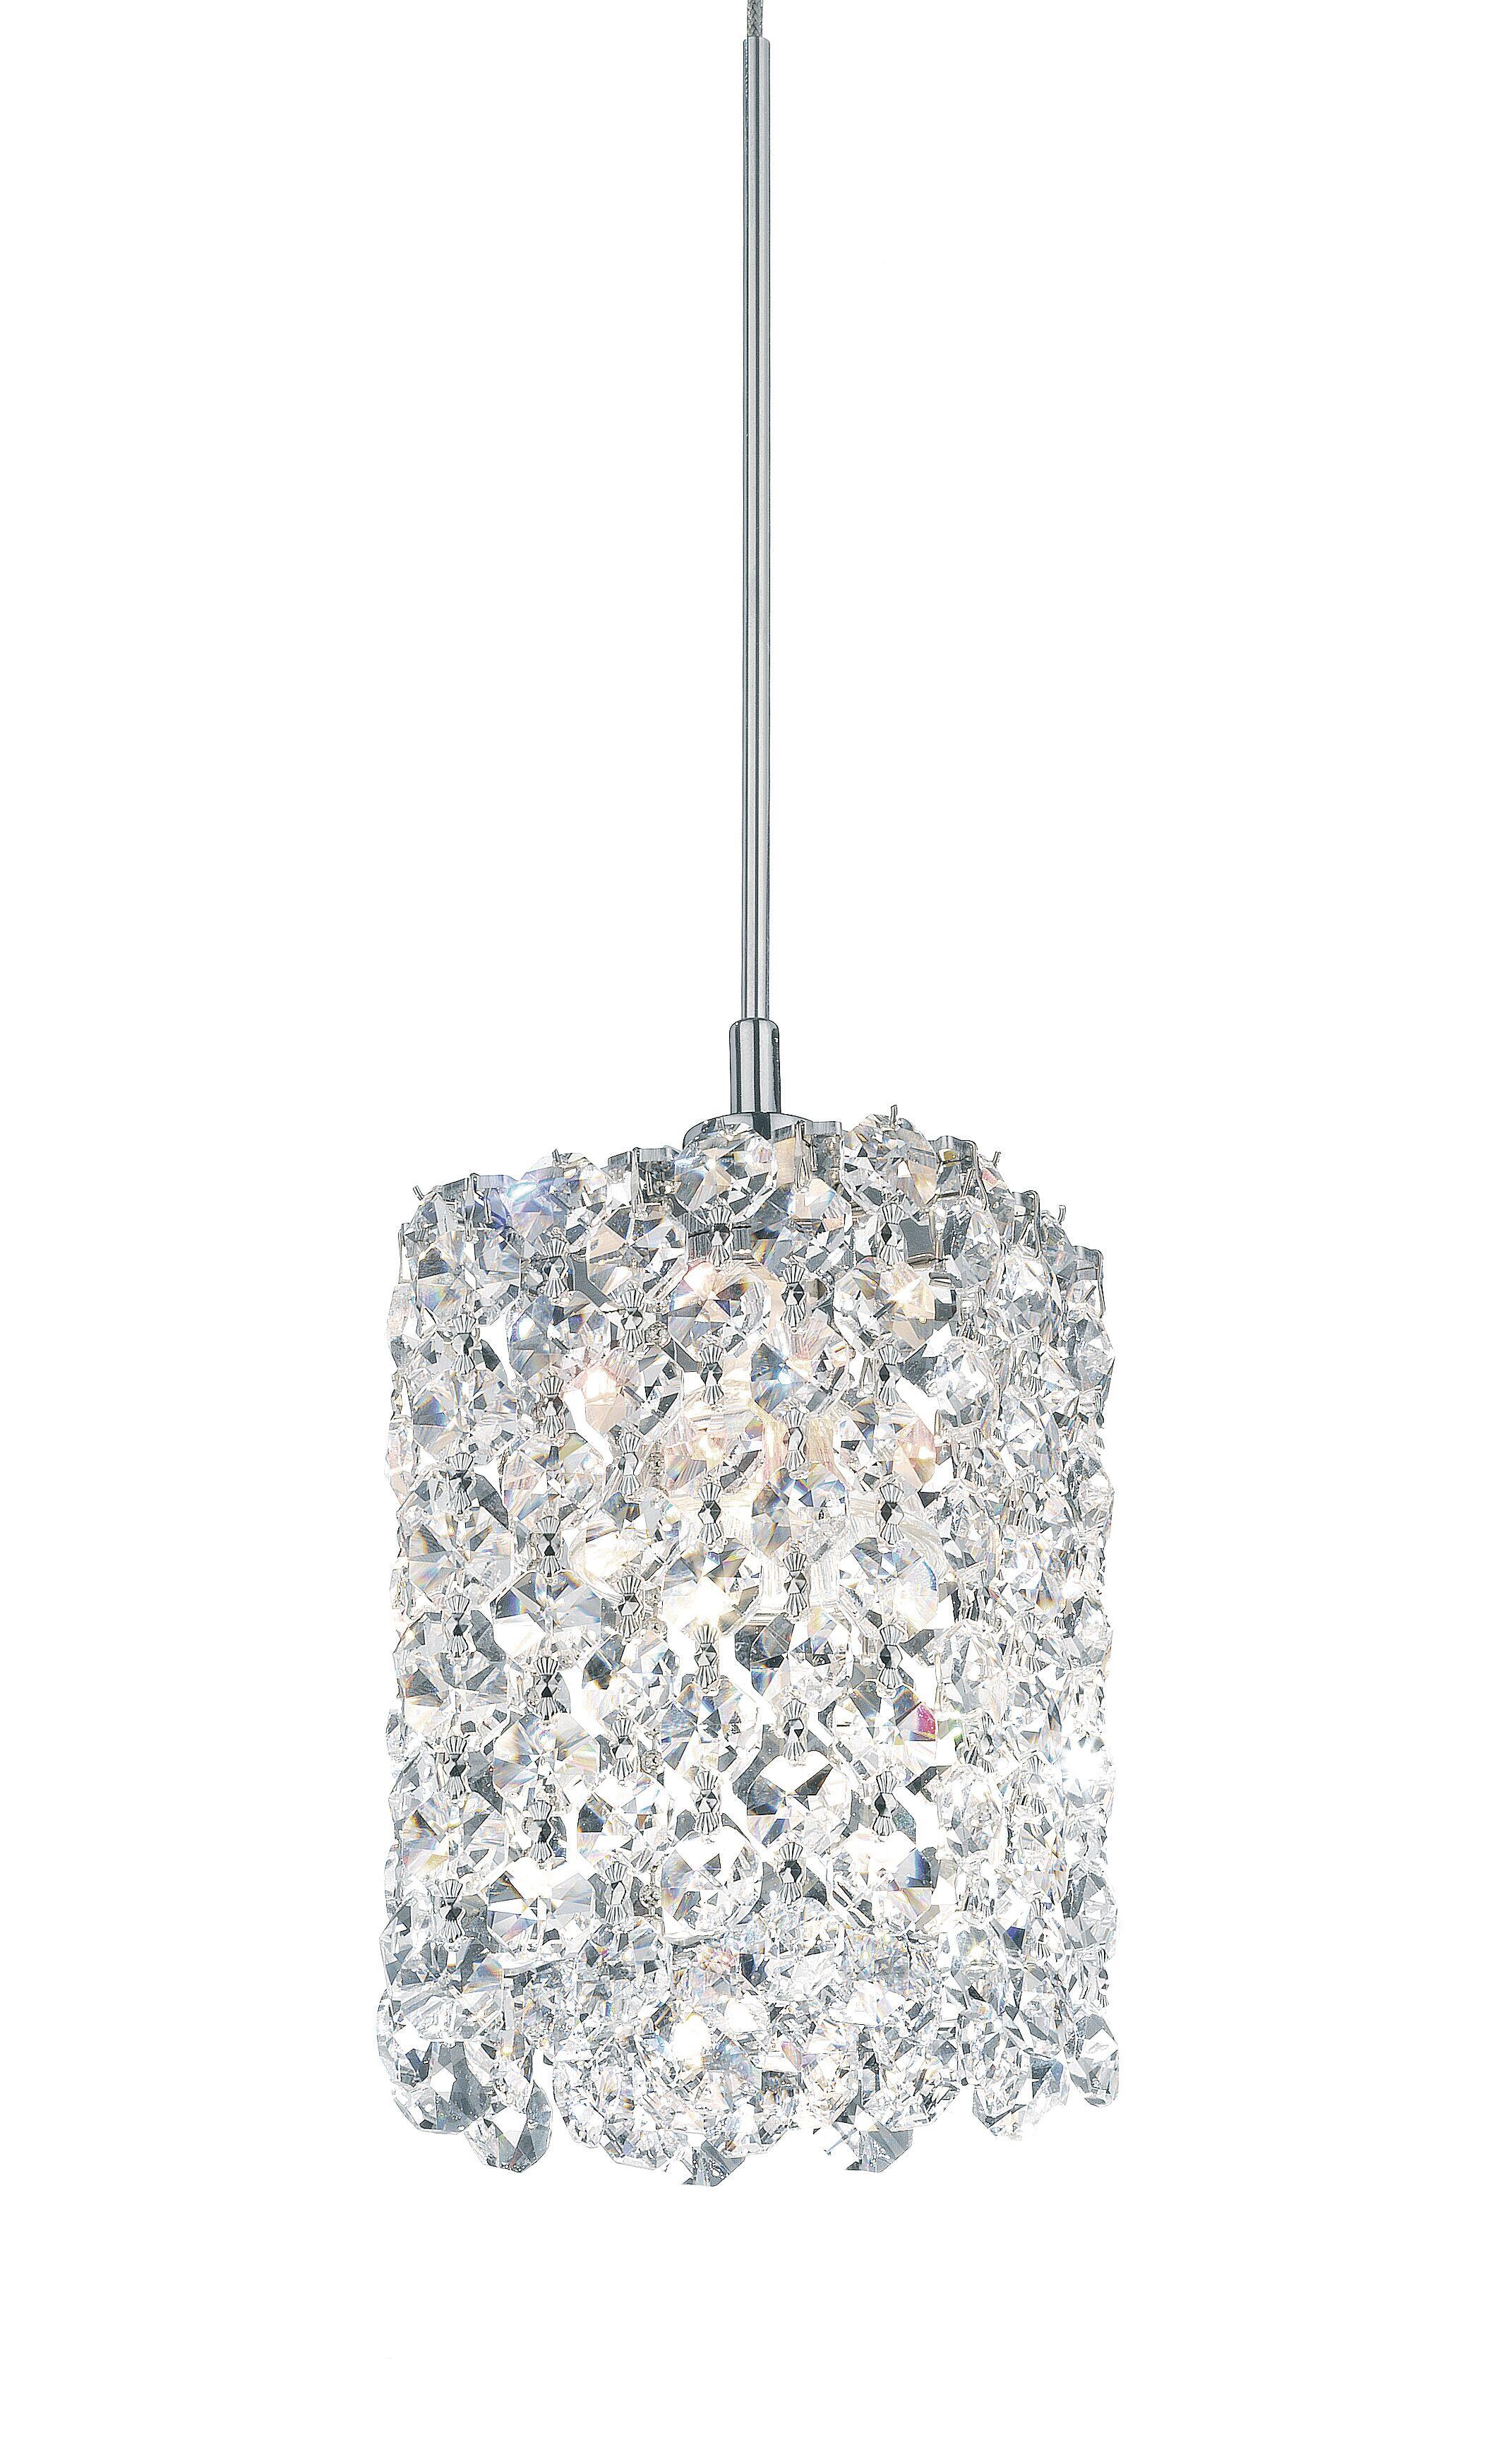 Refrax 1-Light Mini Crystal Pendant Crystal Type: Swarovski Elements Bullet